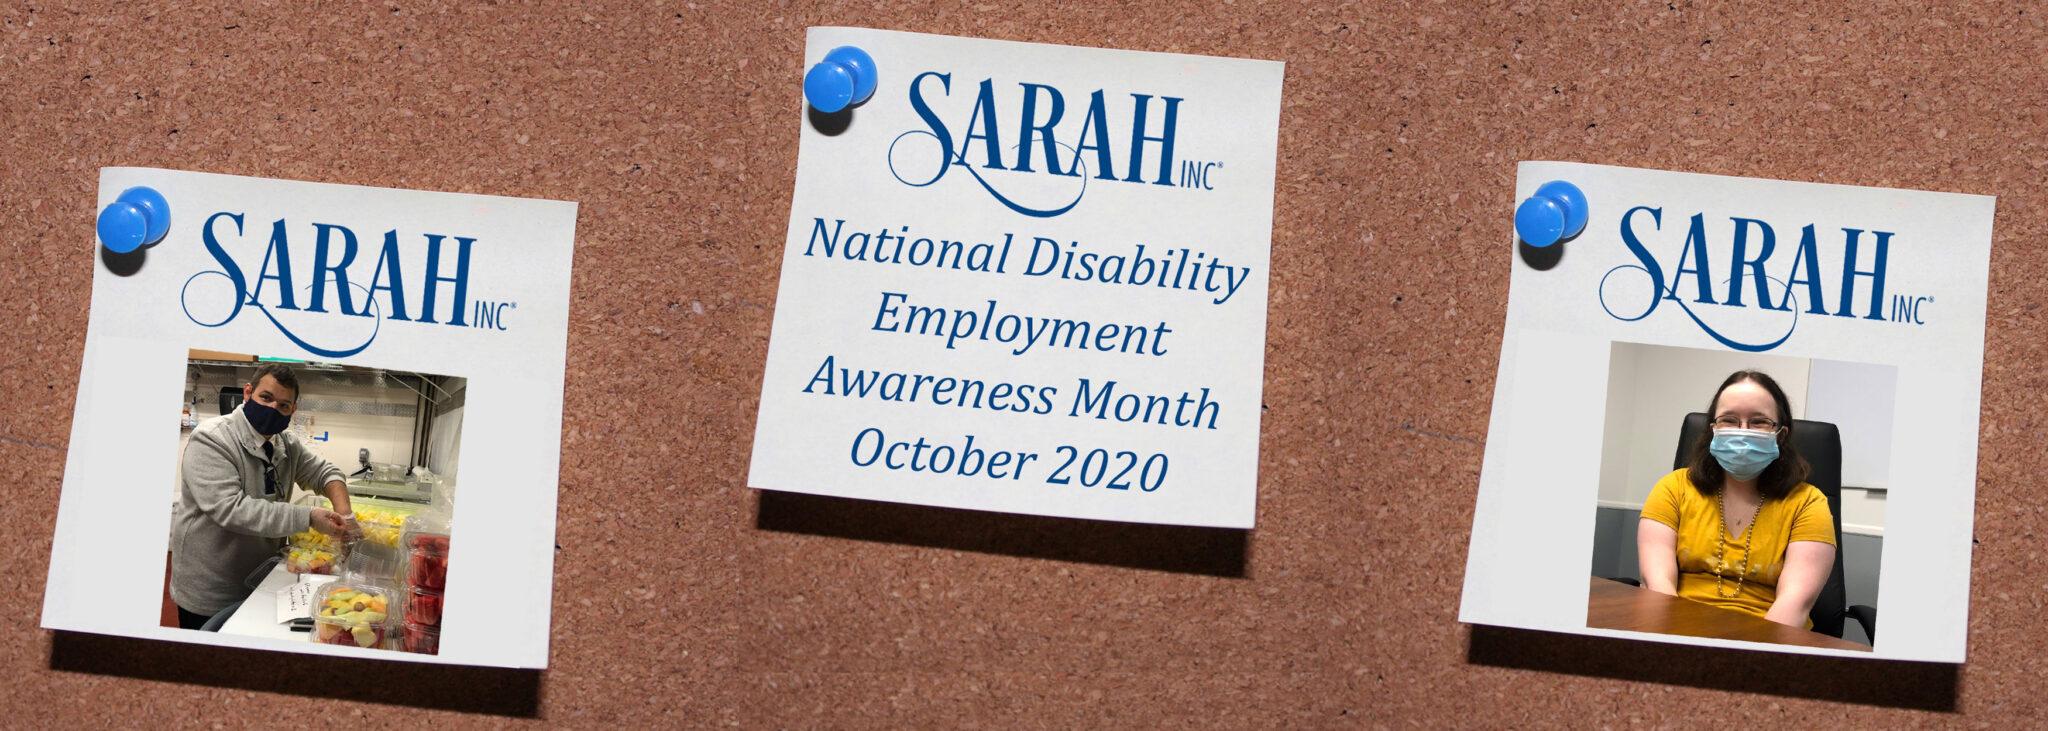 2020 National Disability Employment Awareness Month Banner